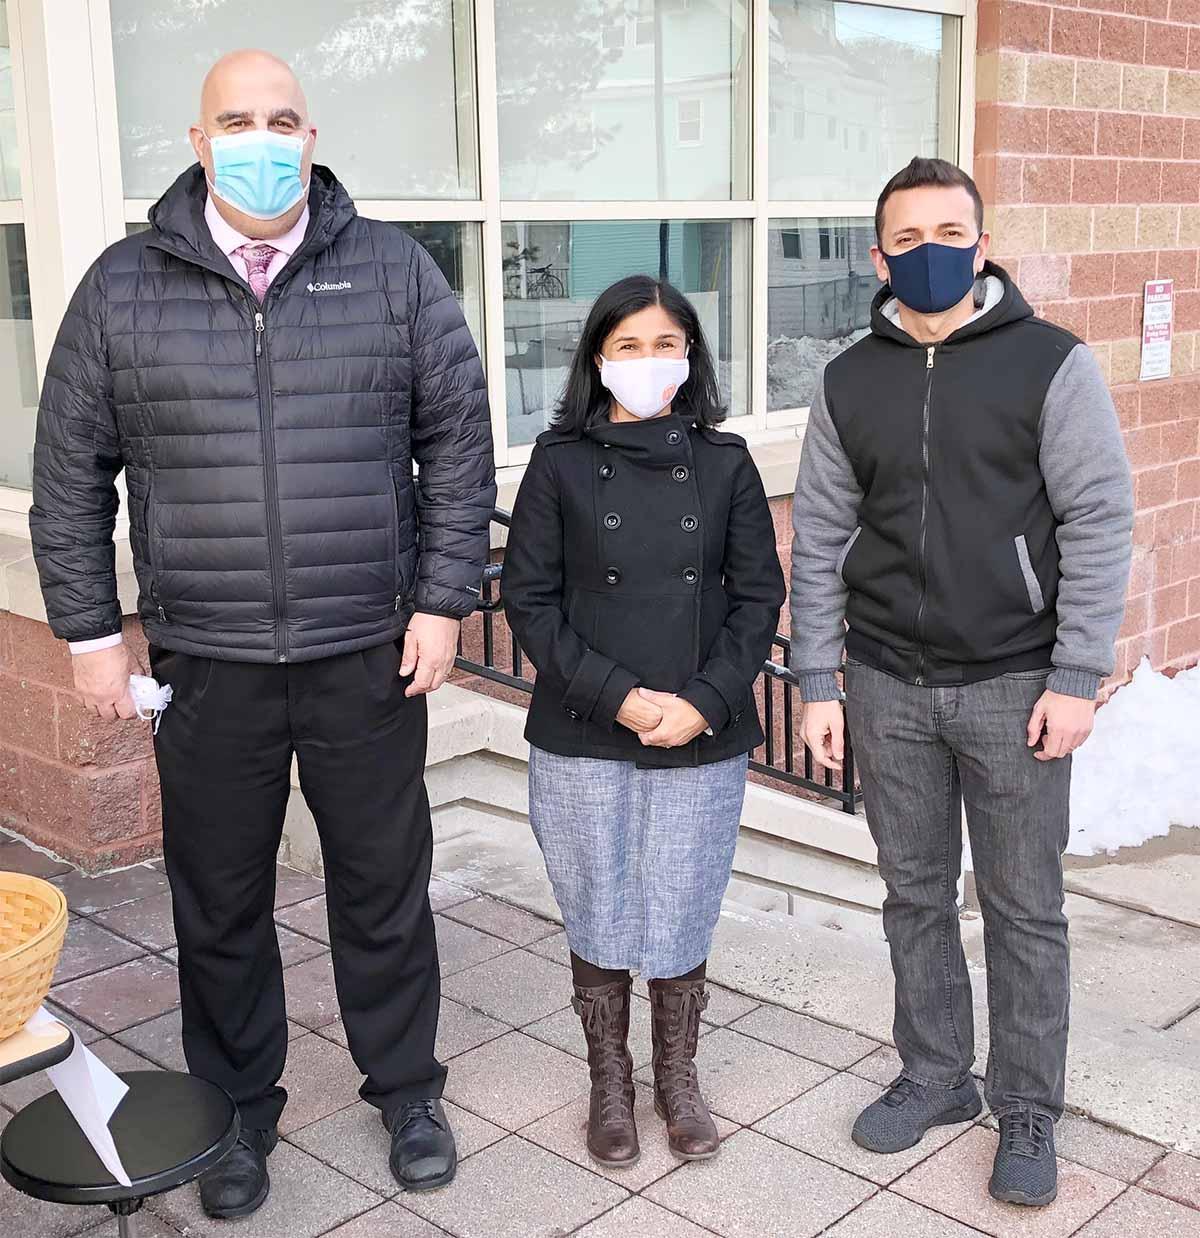 Three people standing, posed photo